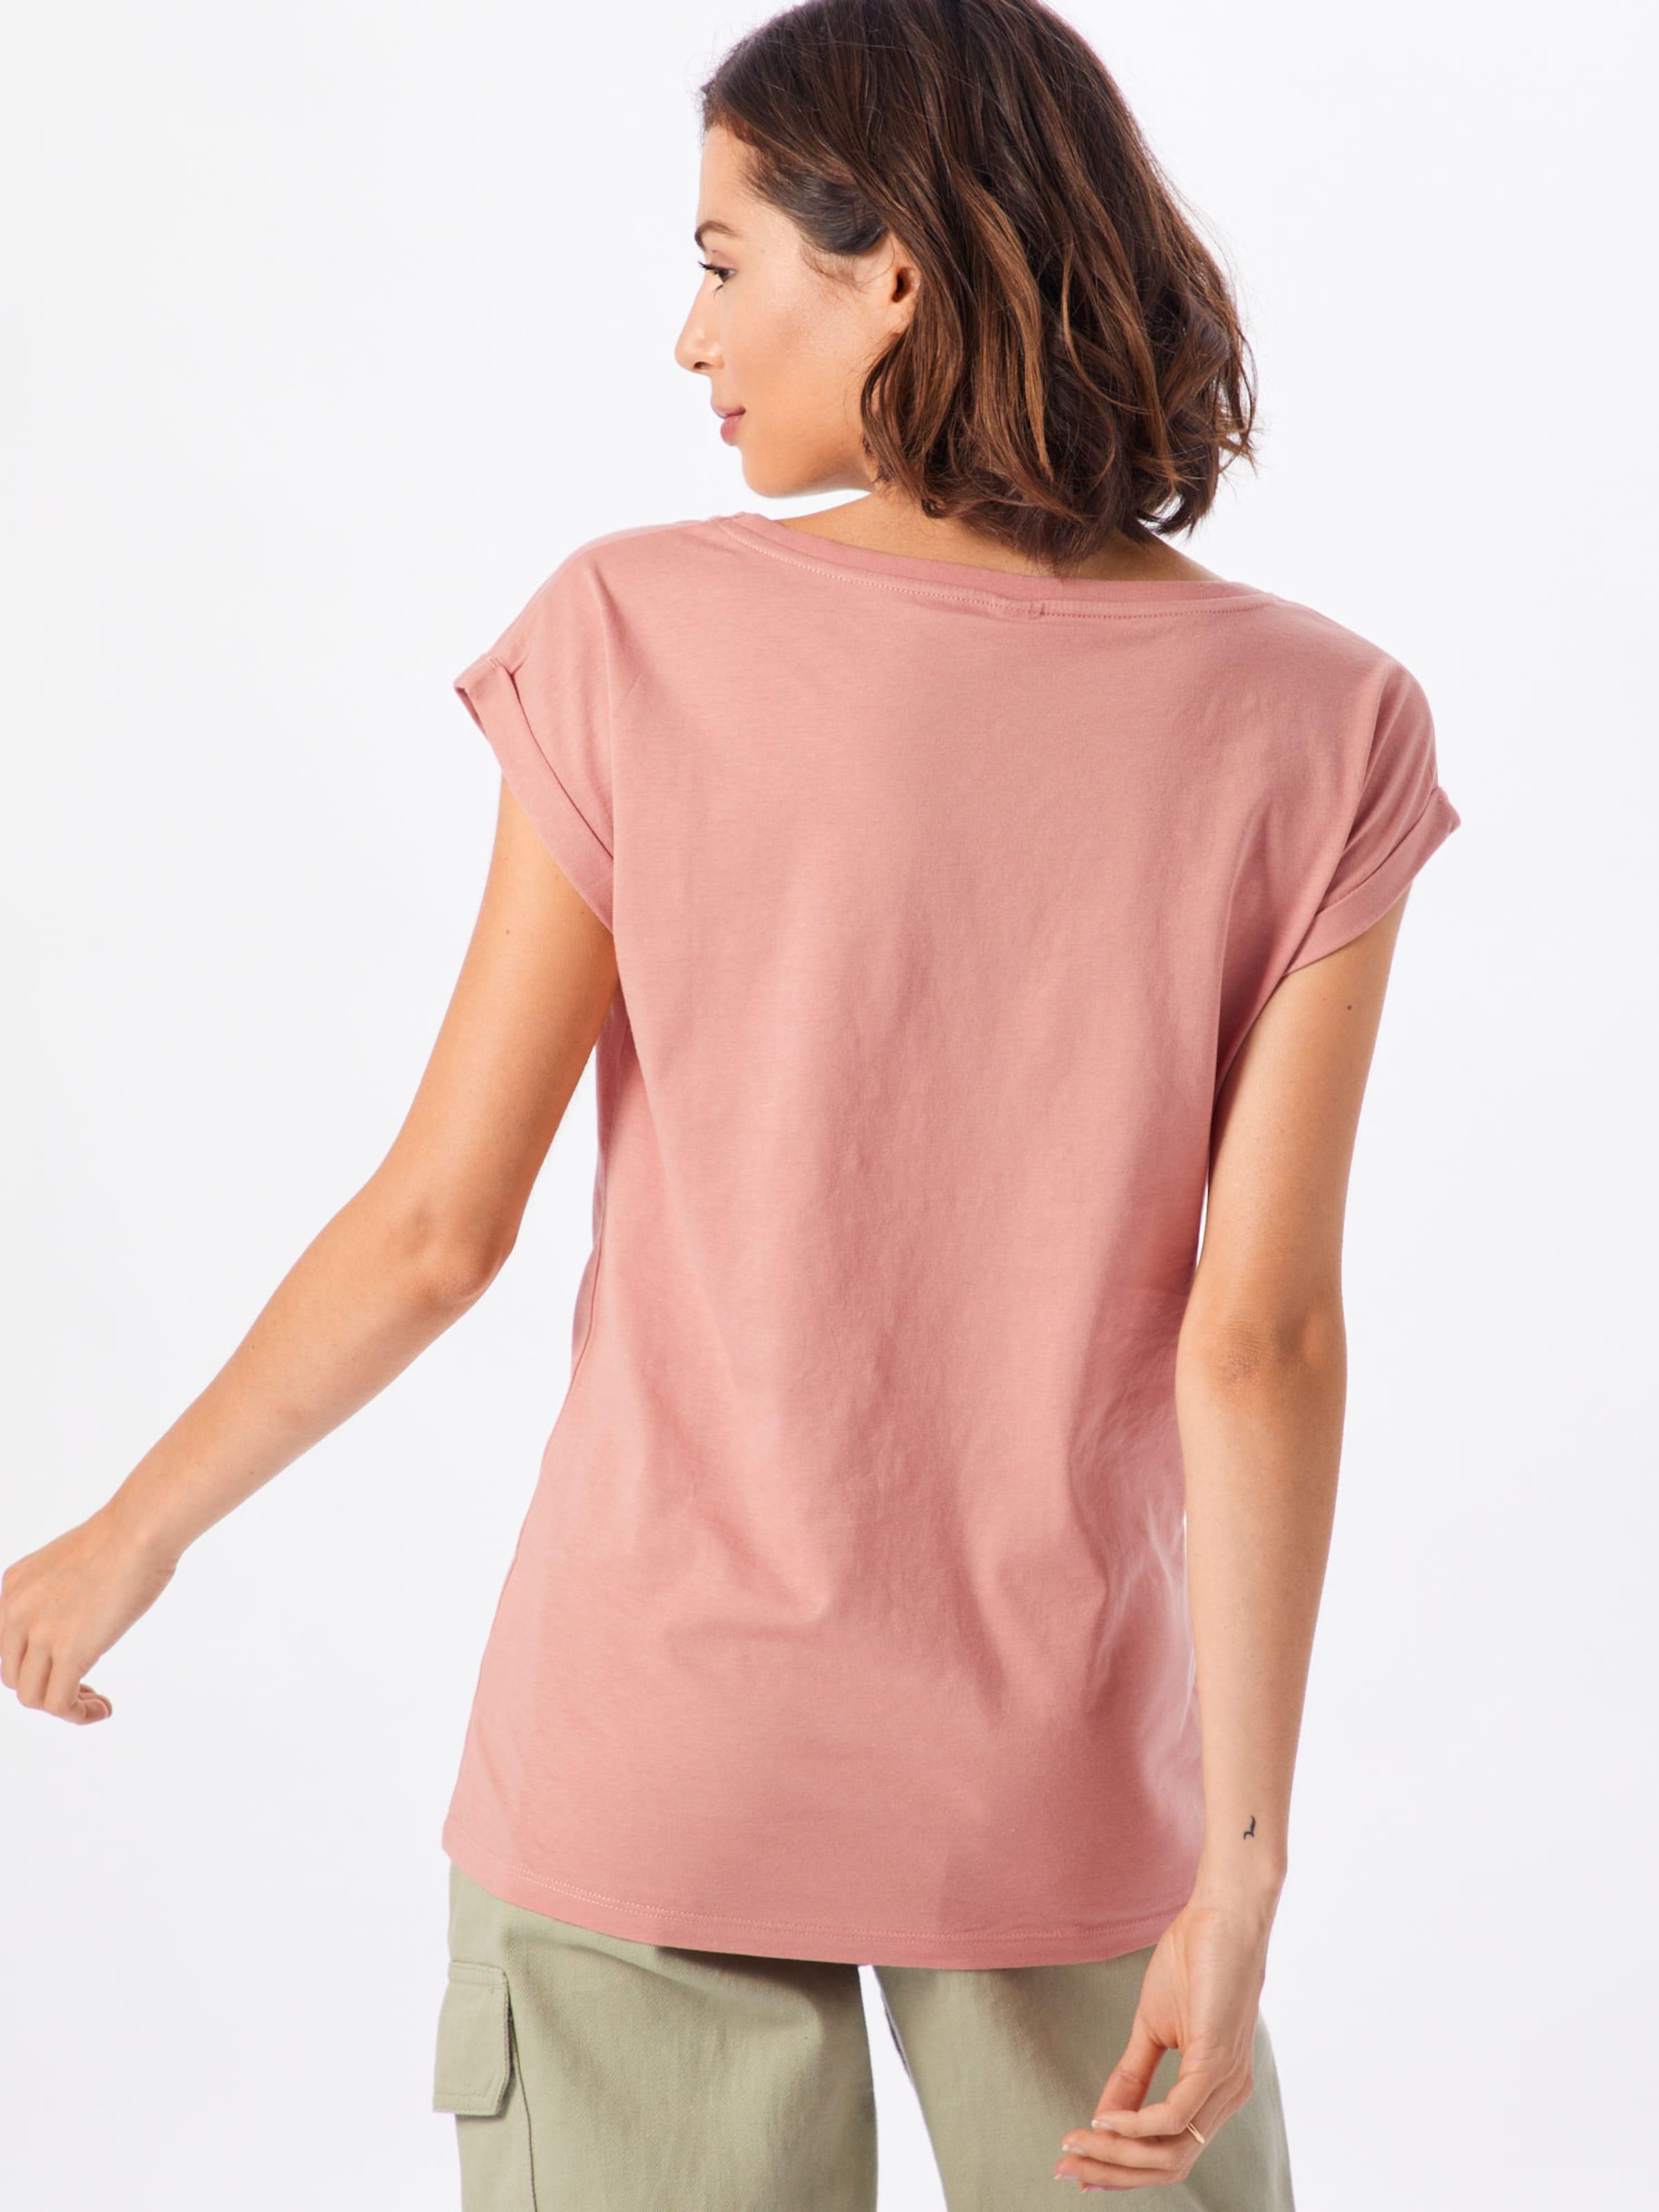 PêcheHomard 2' T shirt 'skateowl Iriedaily En kXZPiTlwuO